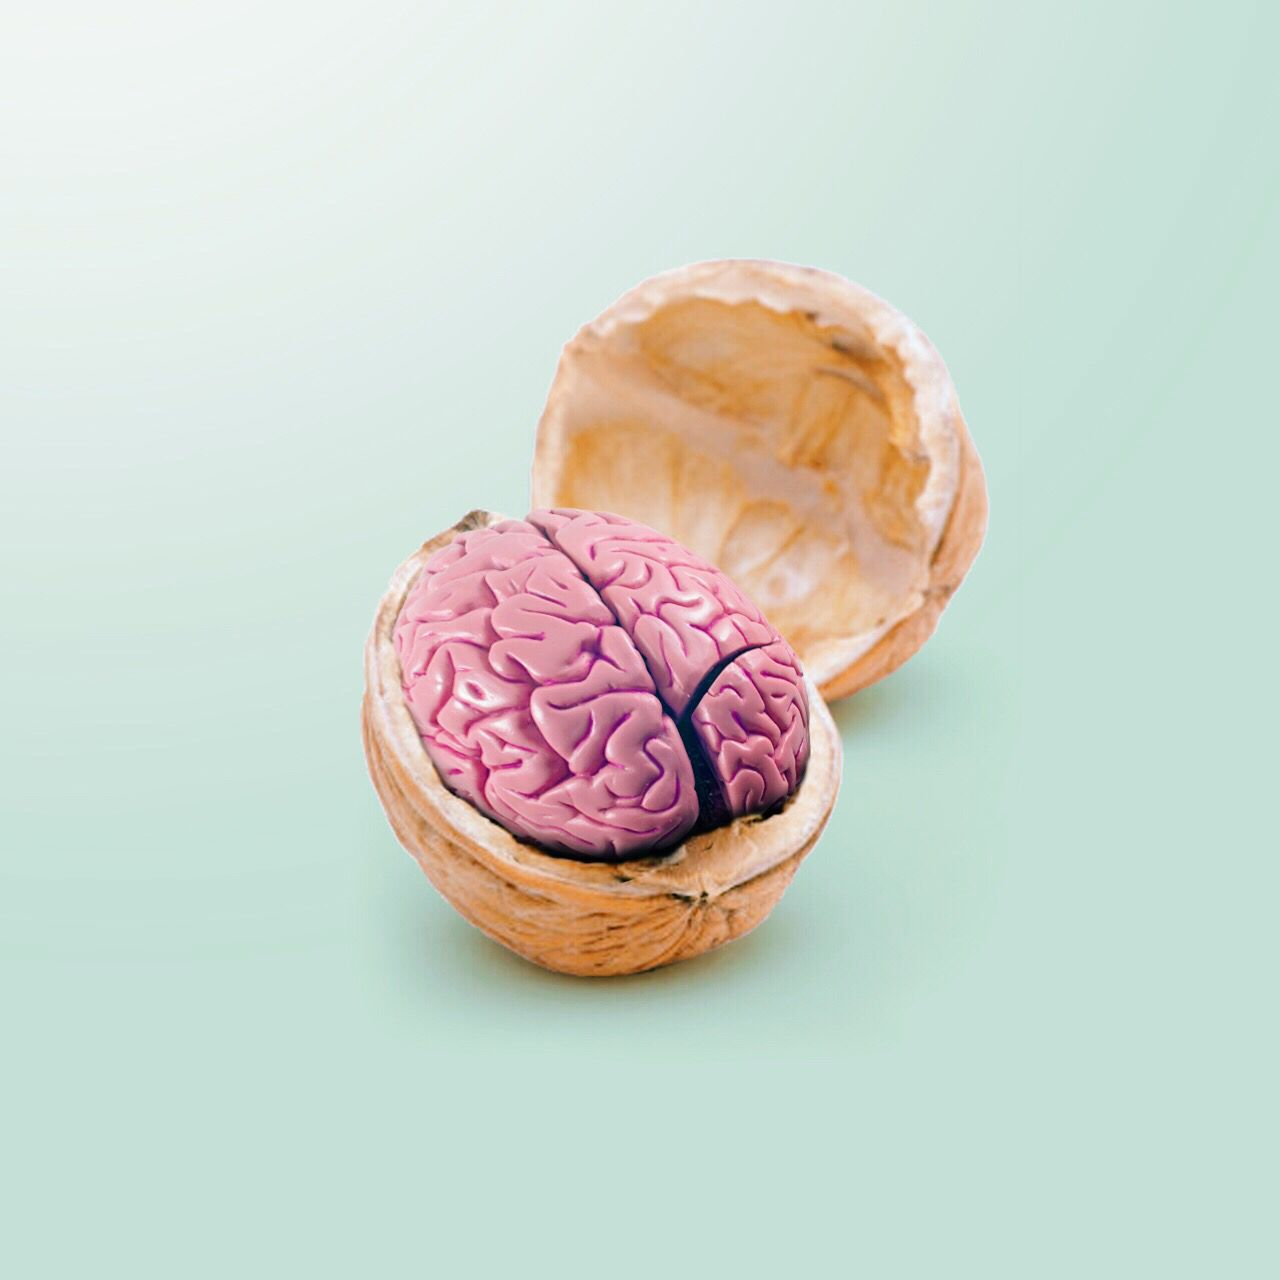 Brain cracker #360brain | by Artem Pozdniakov